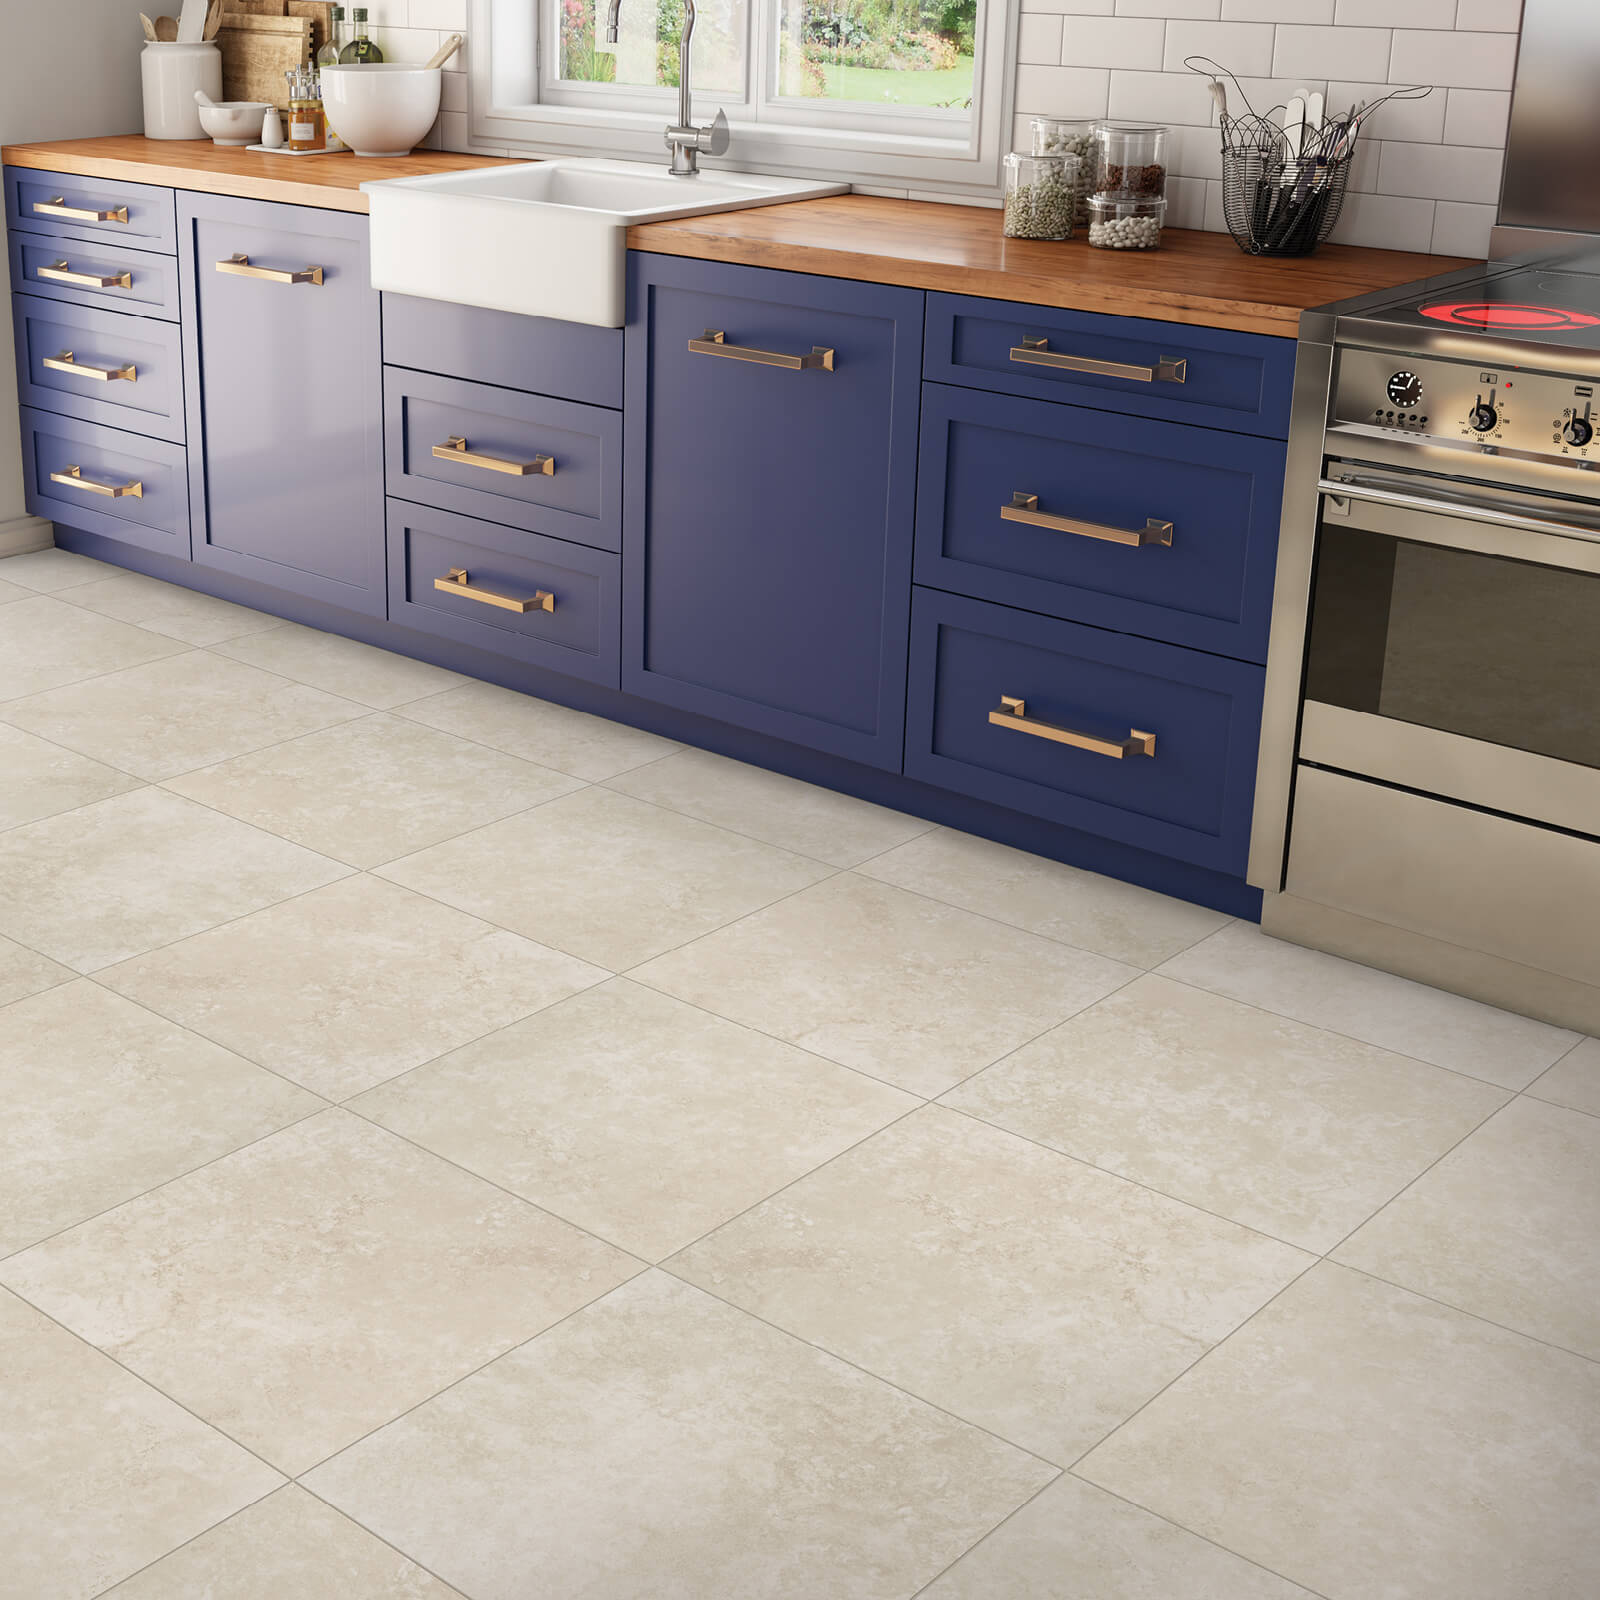 Blue cabinets | Dolphin Carpet & Tile